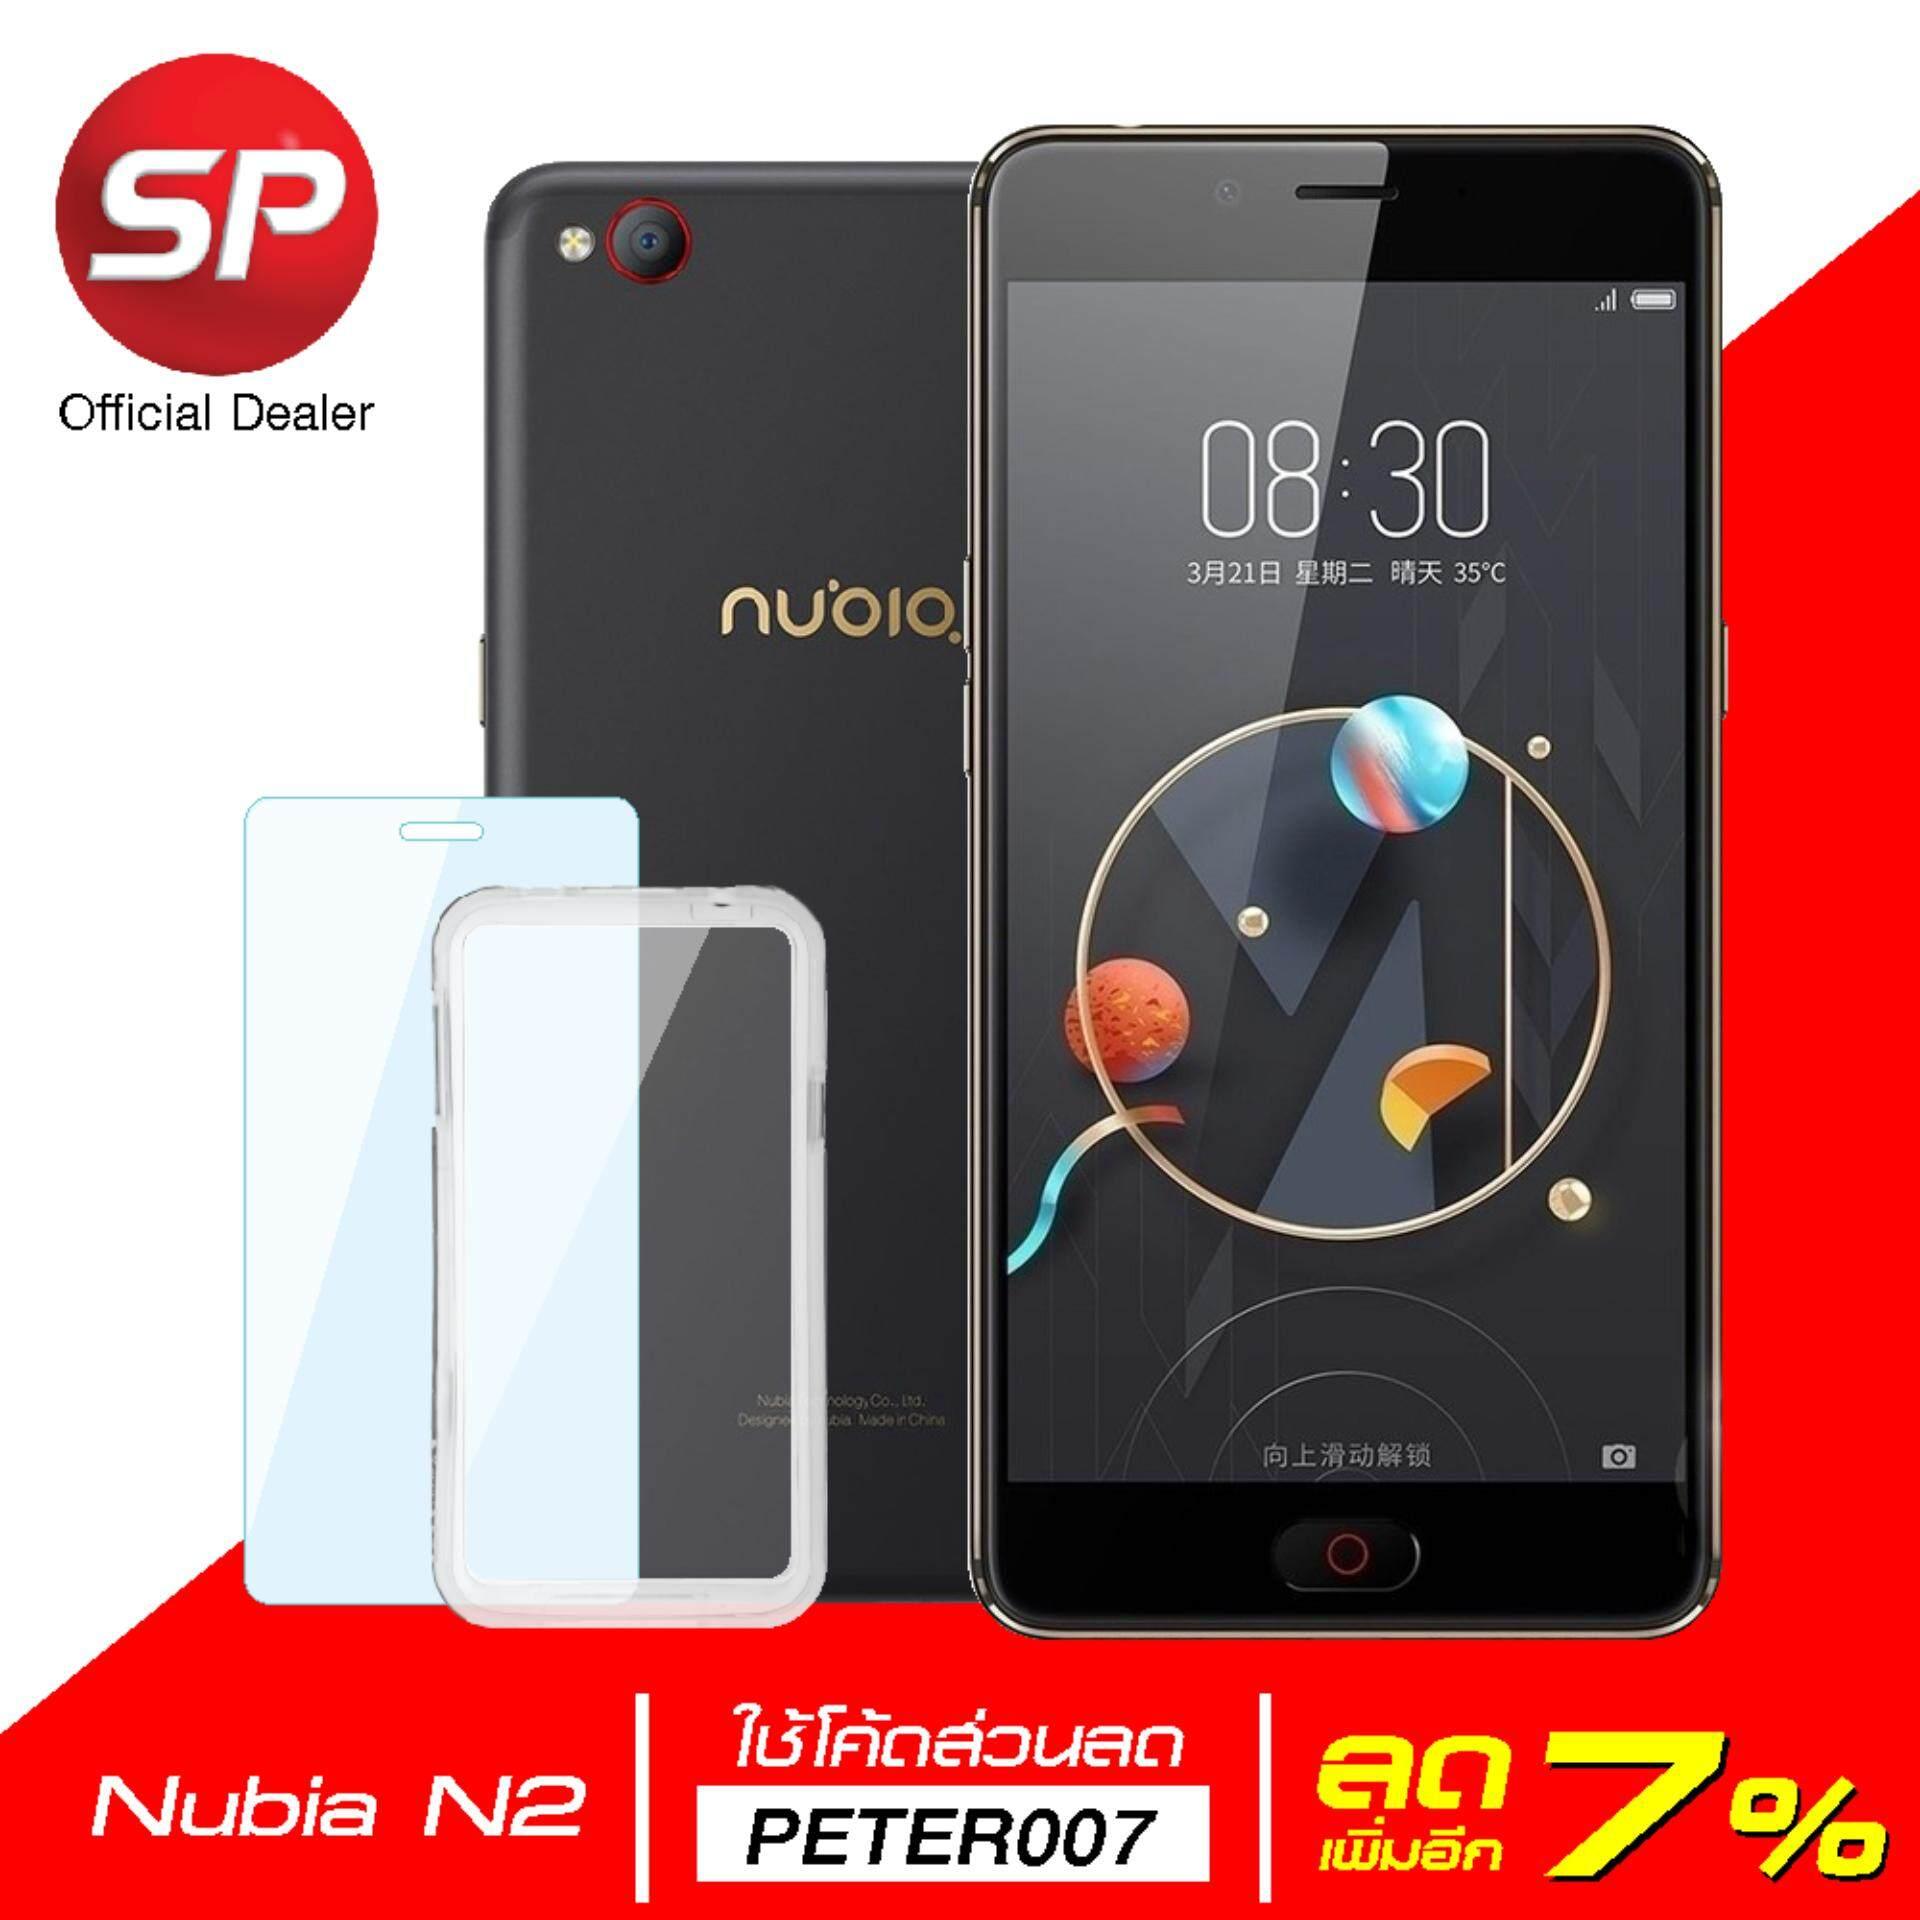 Nubia N2 (4/64GB) แถมฟรี!! เคสใส + ฟิล์มกันรอย (มูลค่า 490.-) รับประกันศูนย์ Nubia ประเทศไทย 1 ปี!!